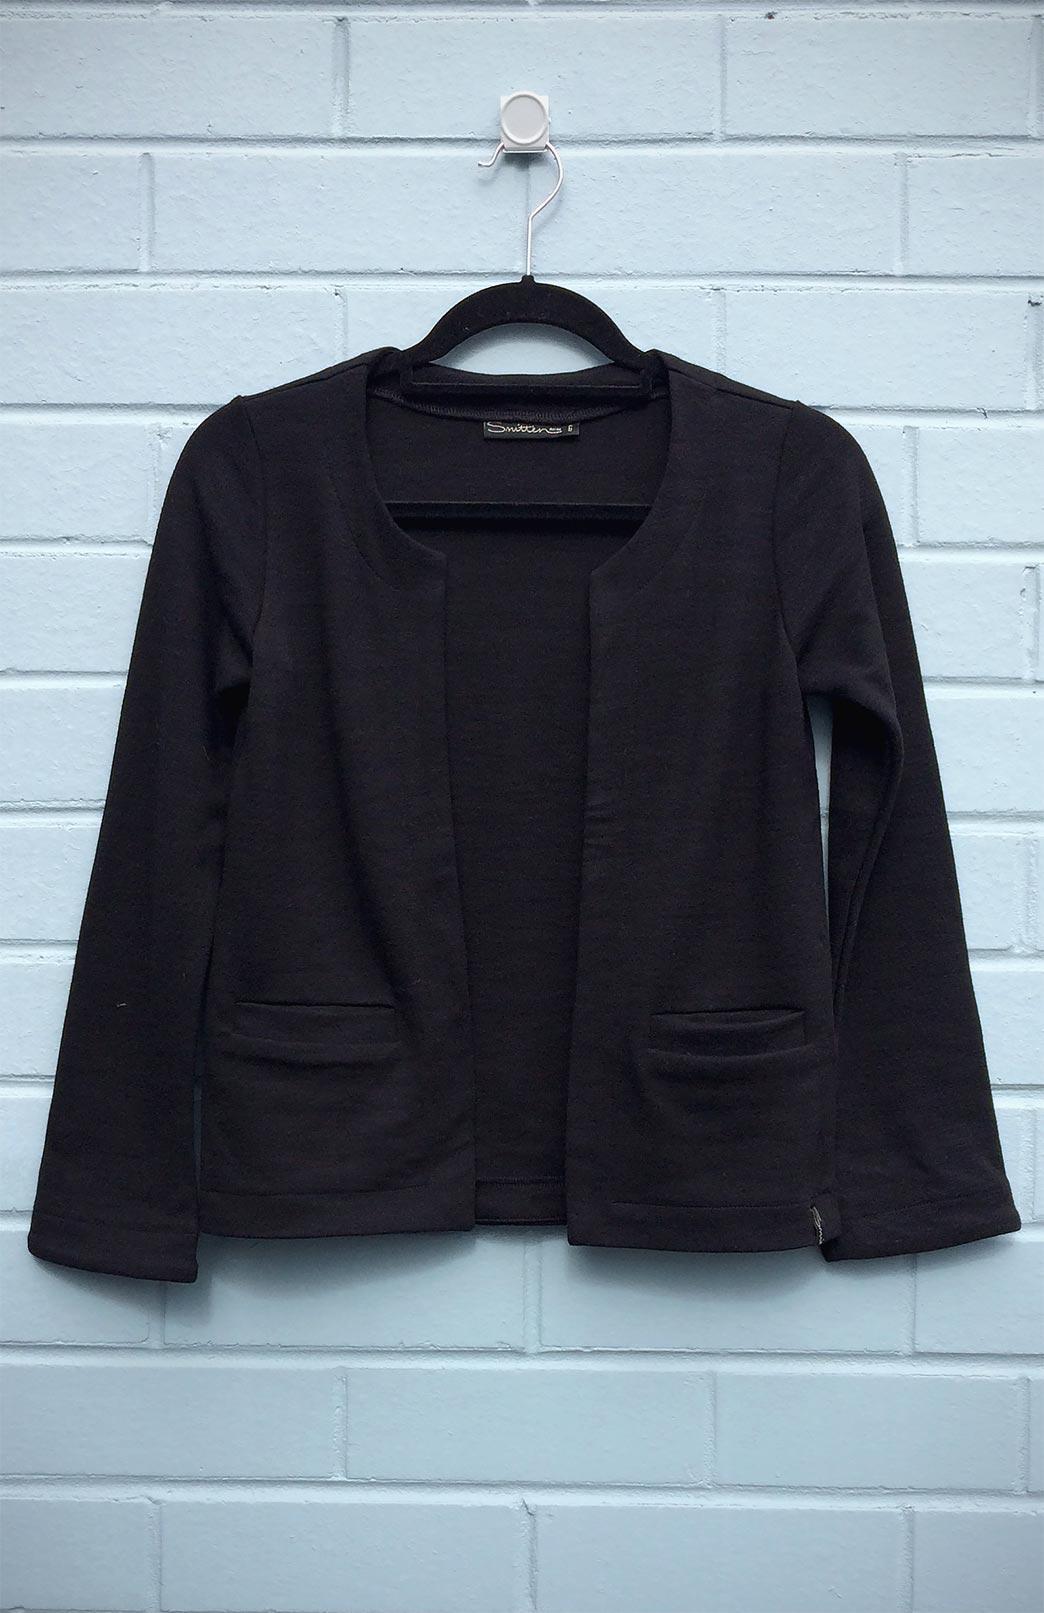 Celeste Jacket (Seconds) - Women's Pure Merino Wool Jacket with open front and placket pockets - Smitten Merino Tasmania Australia